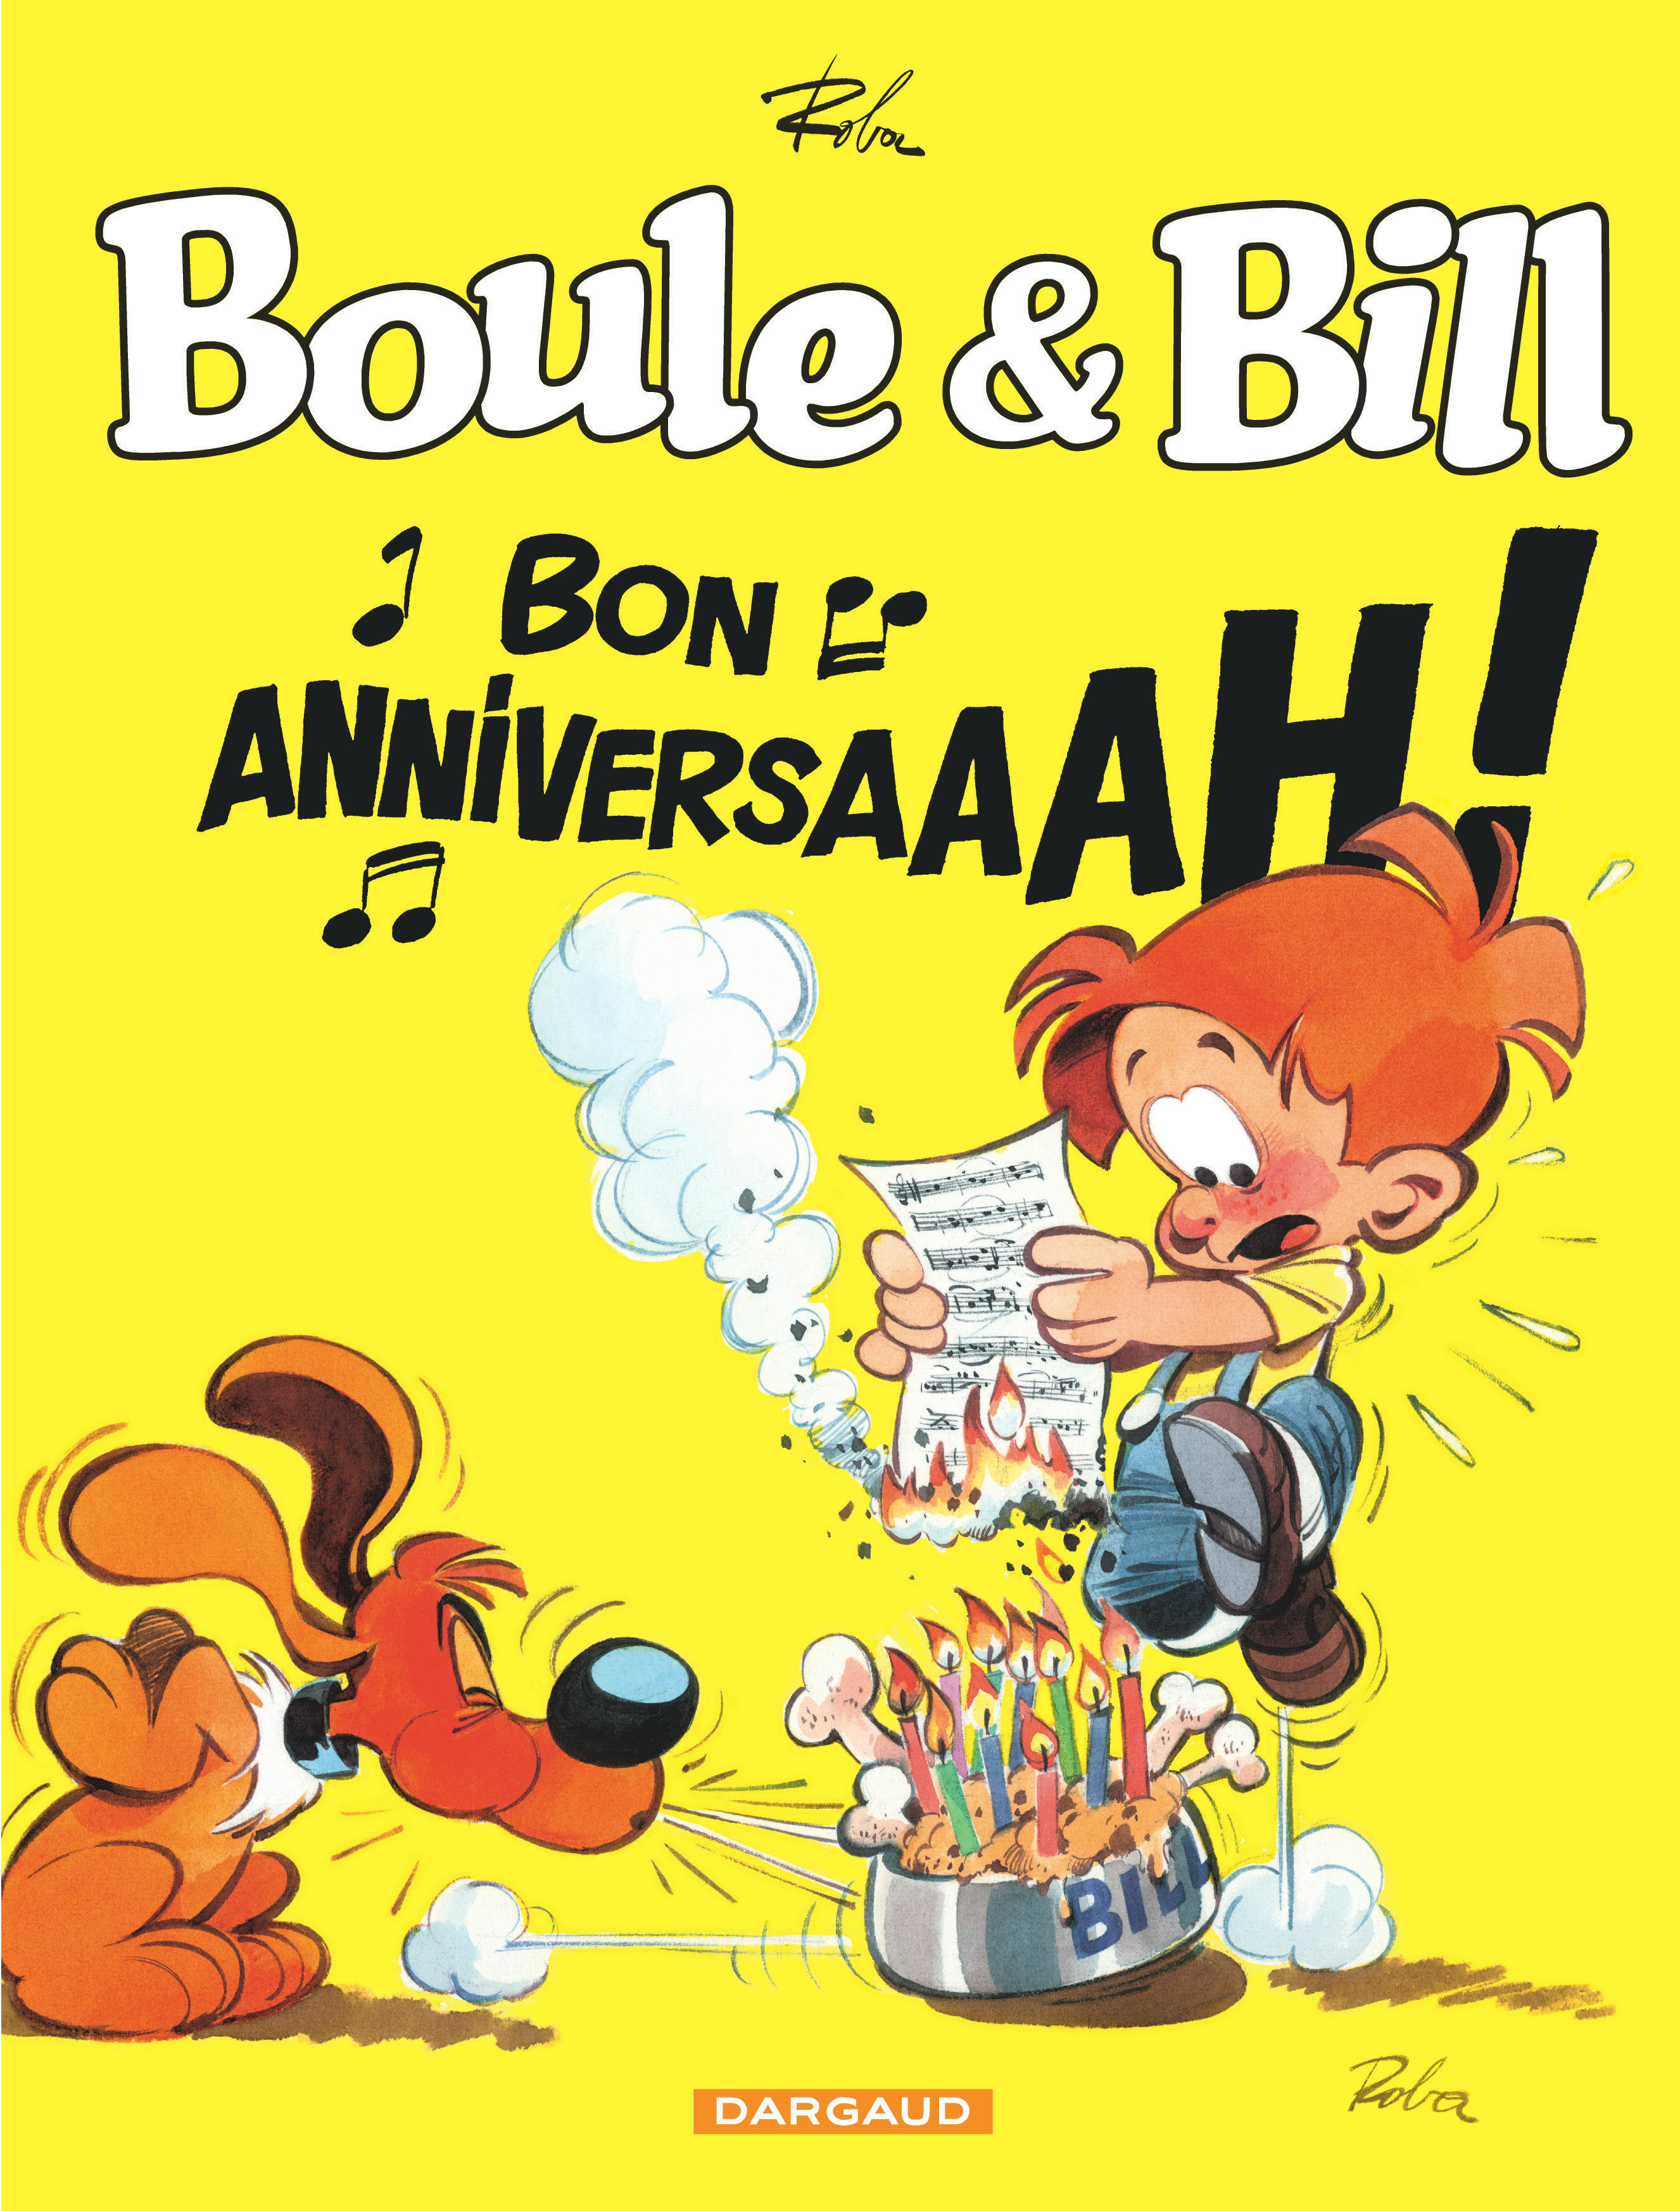 BOULE & BILL - TOME 0 - BOULE & BILL - BON ANNIVERSAIRE !